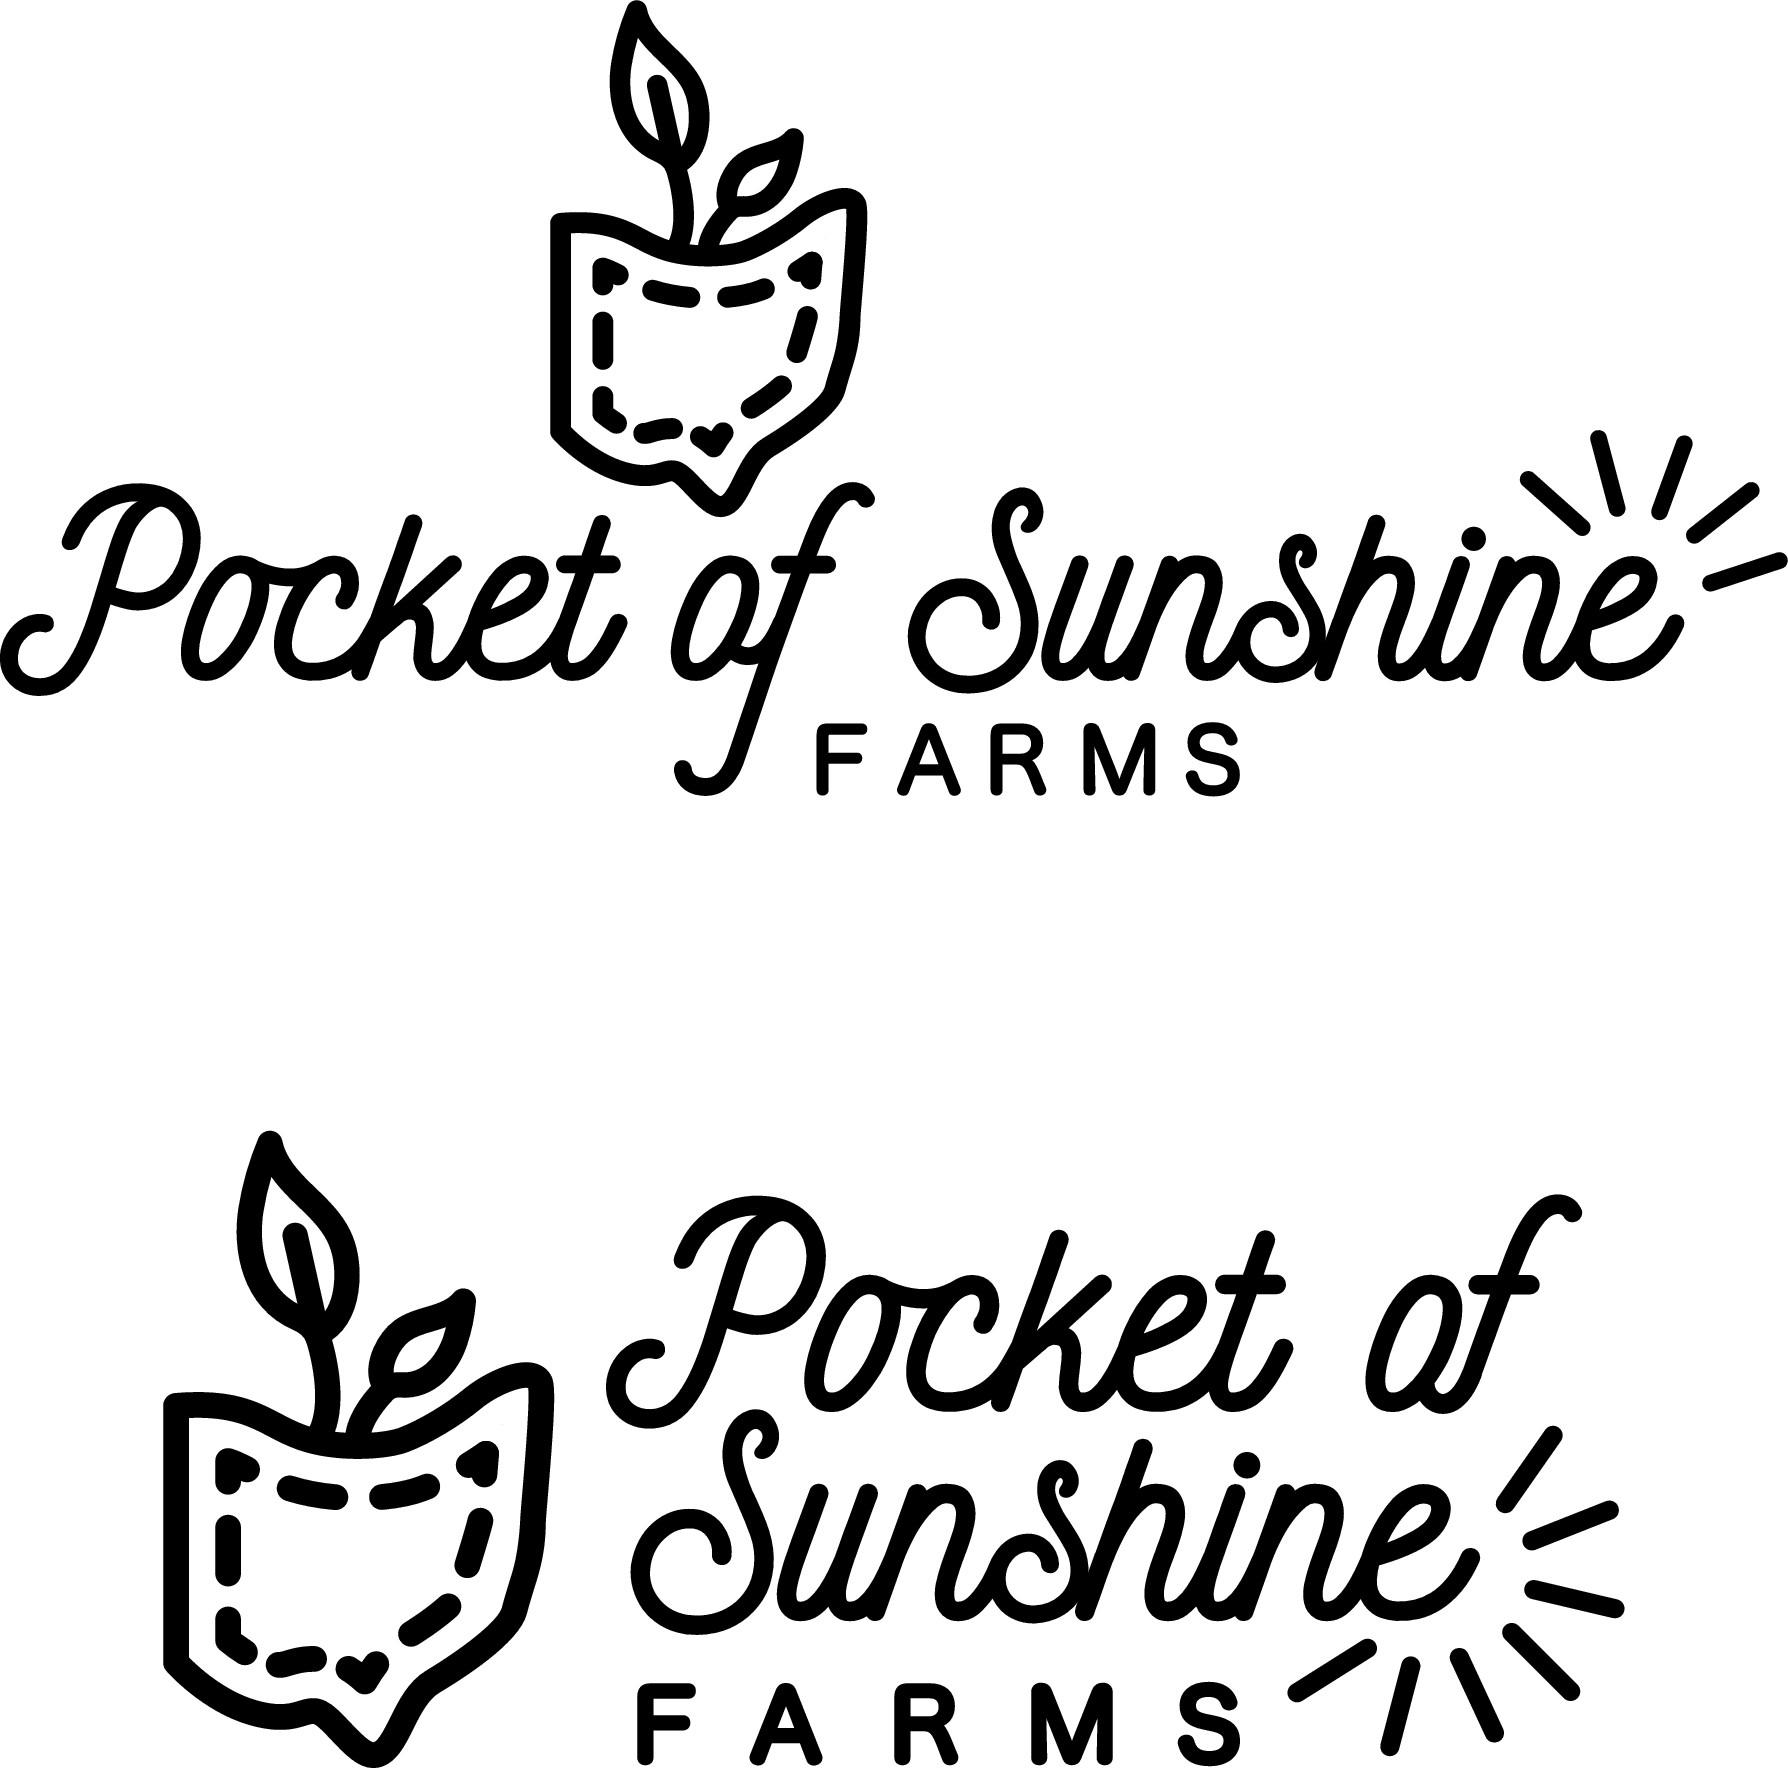 Create a meaningful logo for an urban farm in Ohio